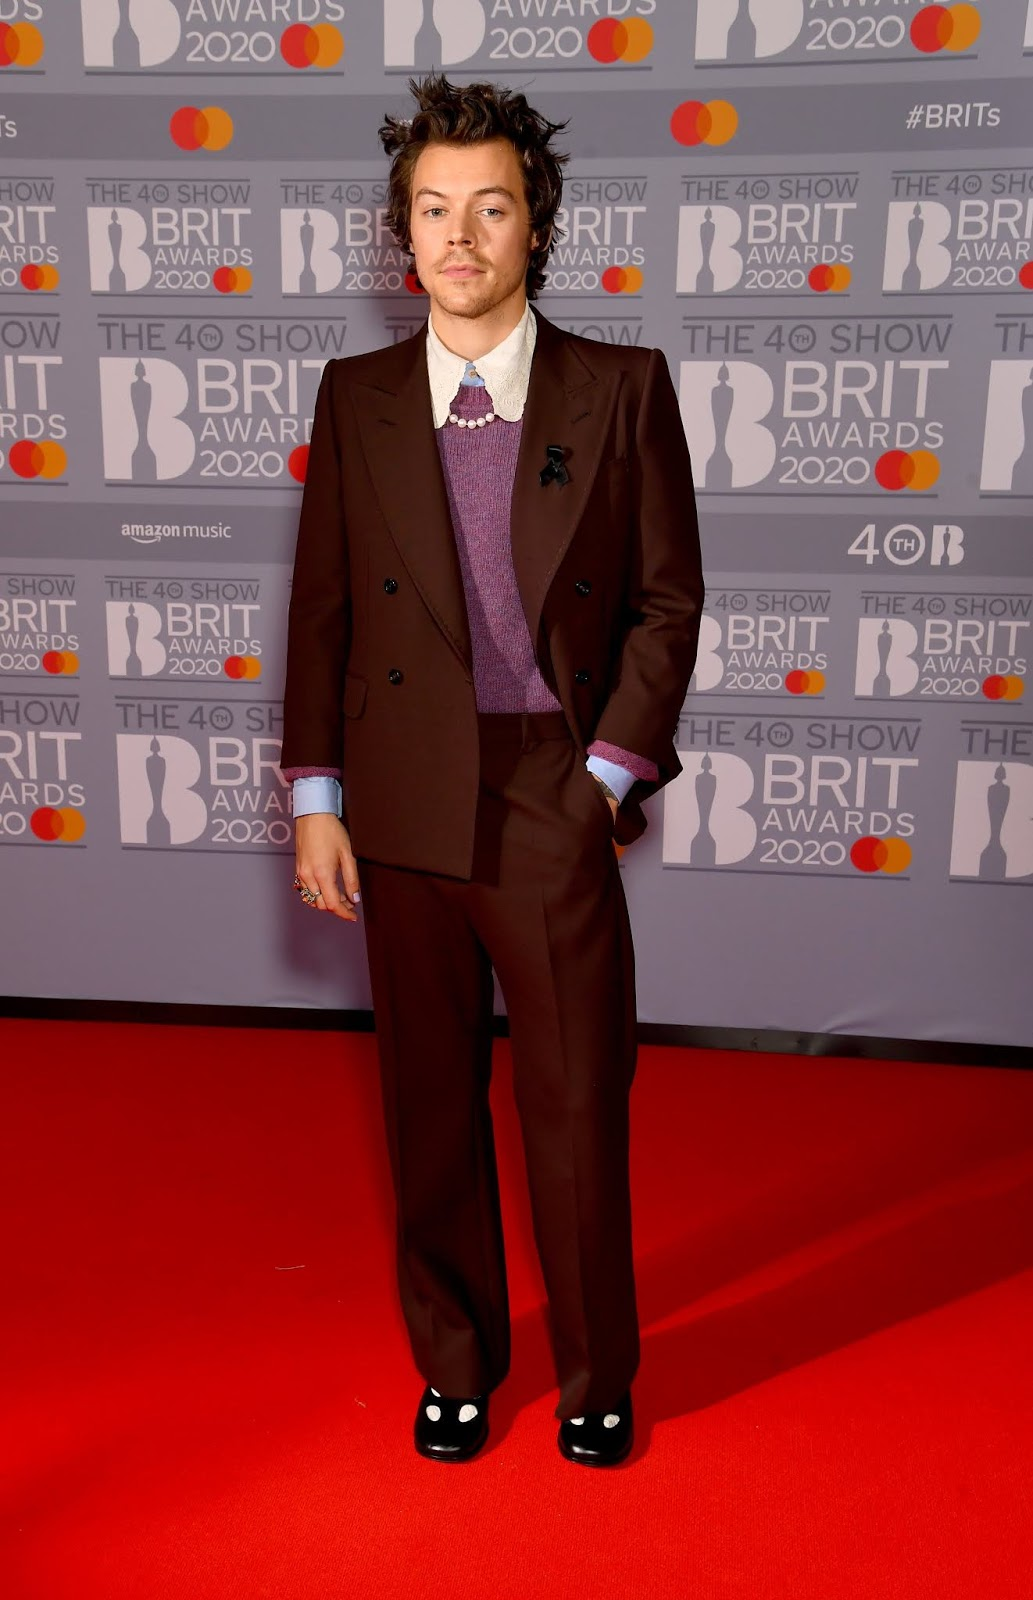 Harry Styles arrives at BRIT Awards wearing black ribbon after Caroline Flack's tragic death